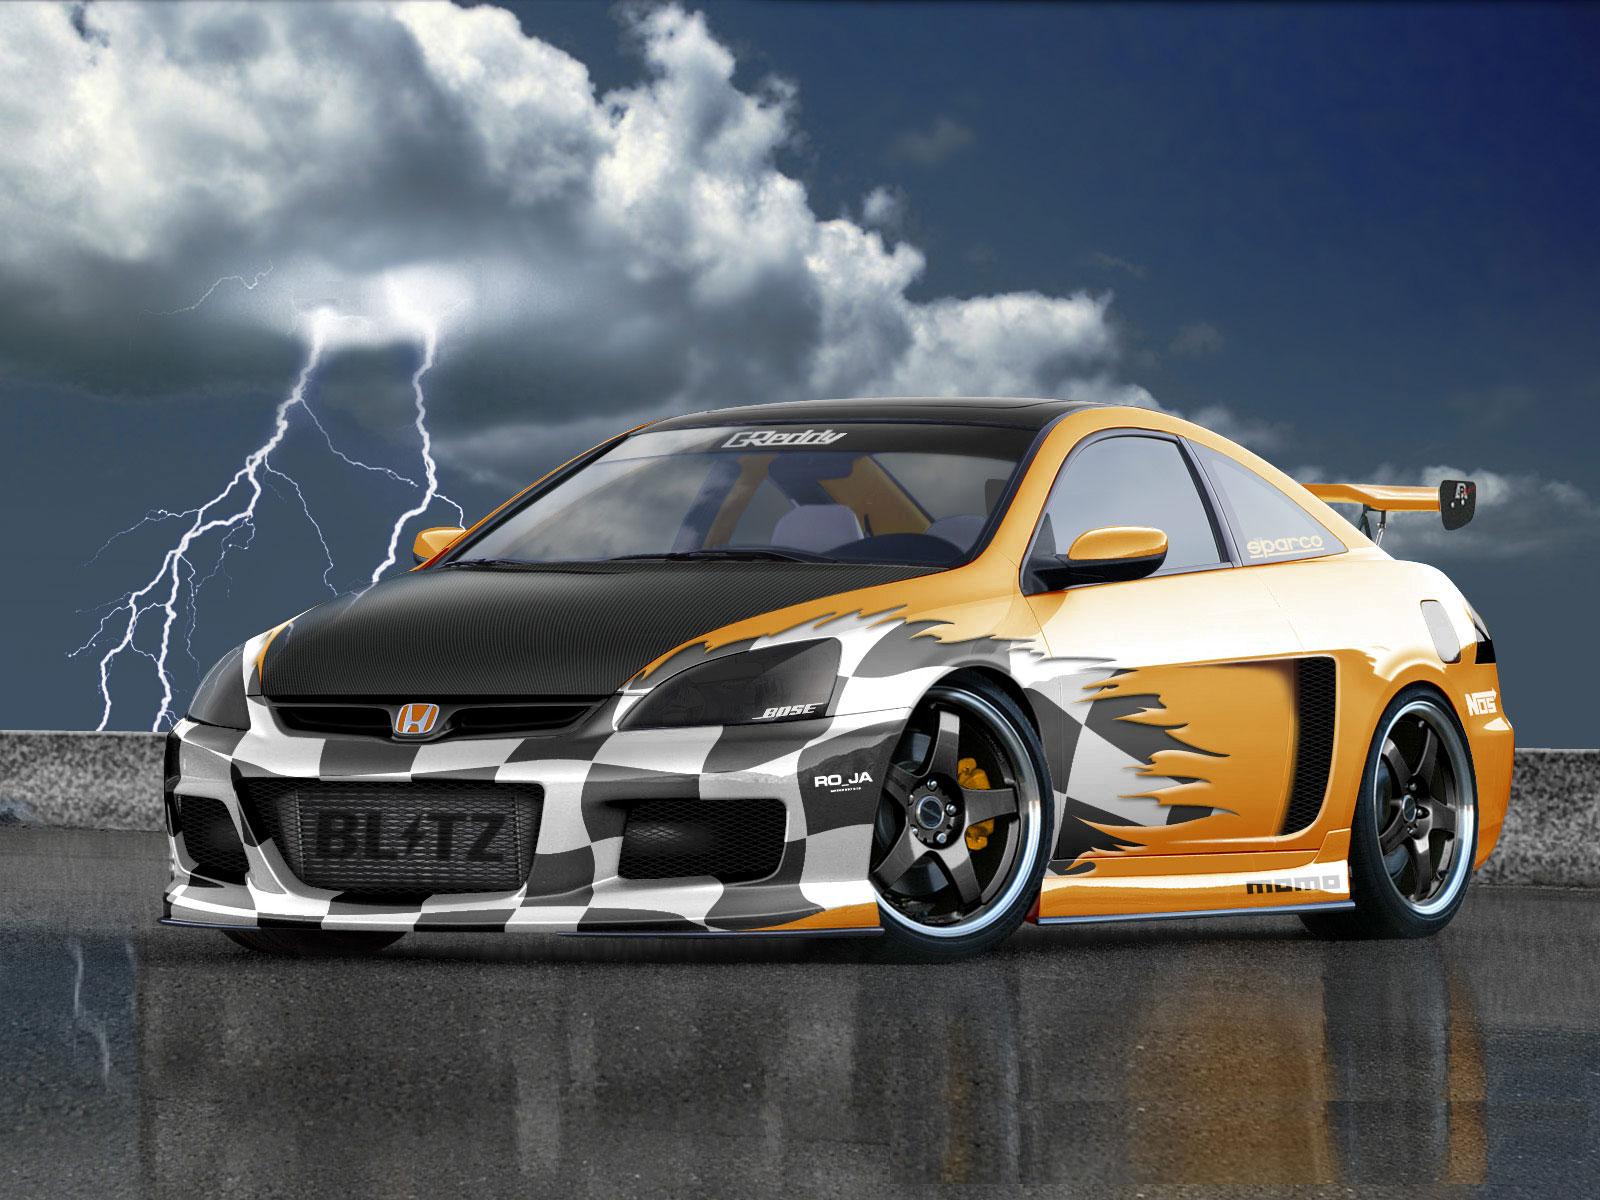 Hd-Car wallpapers: cool sports car wallpaper